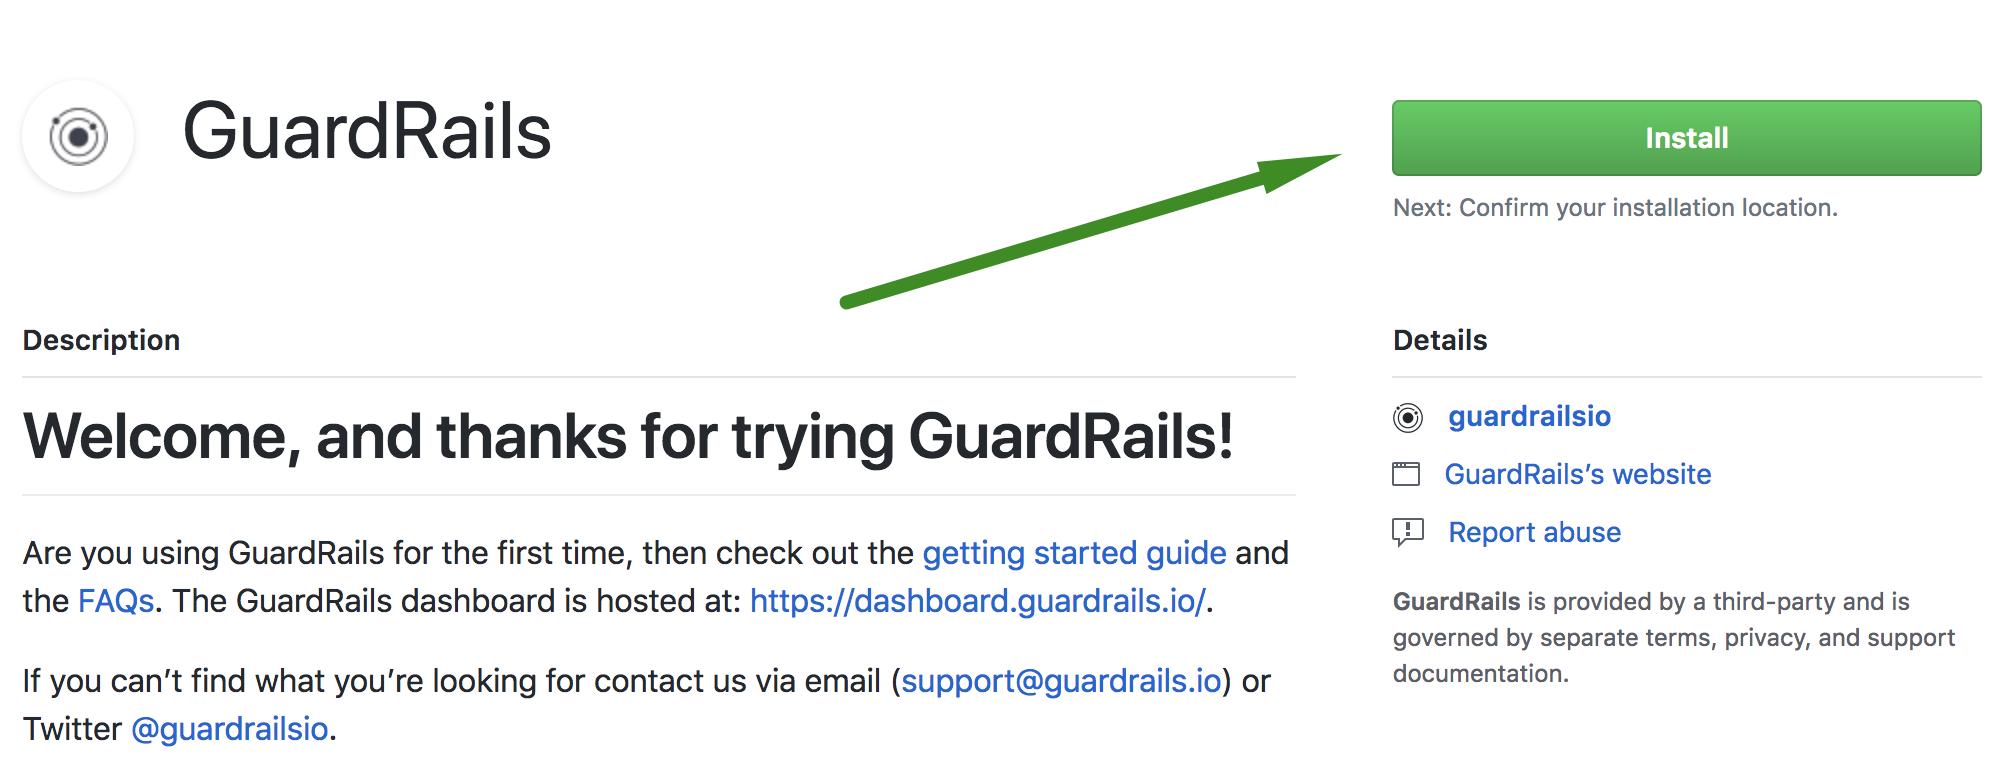 Install GuardRails GitHub App